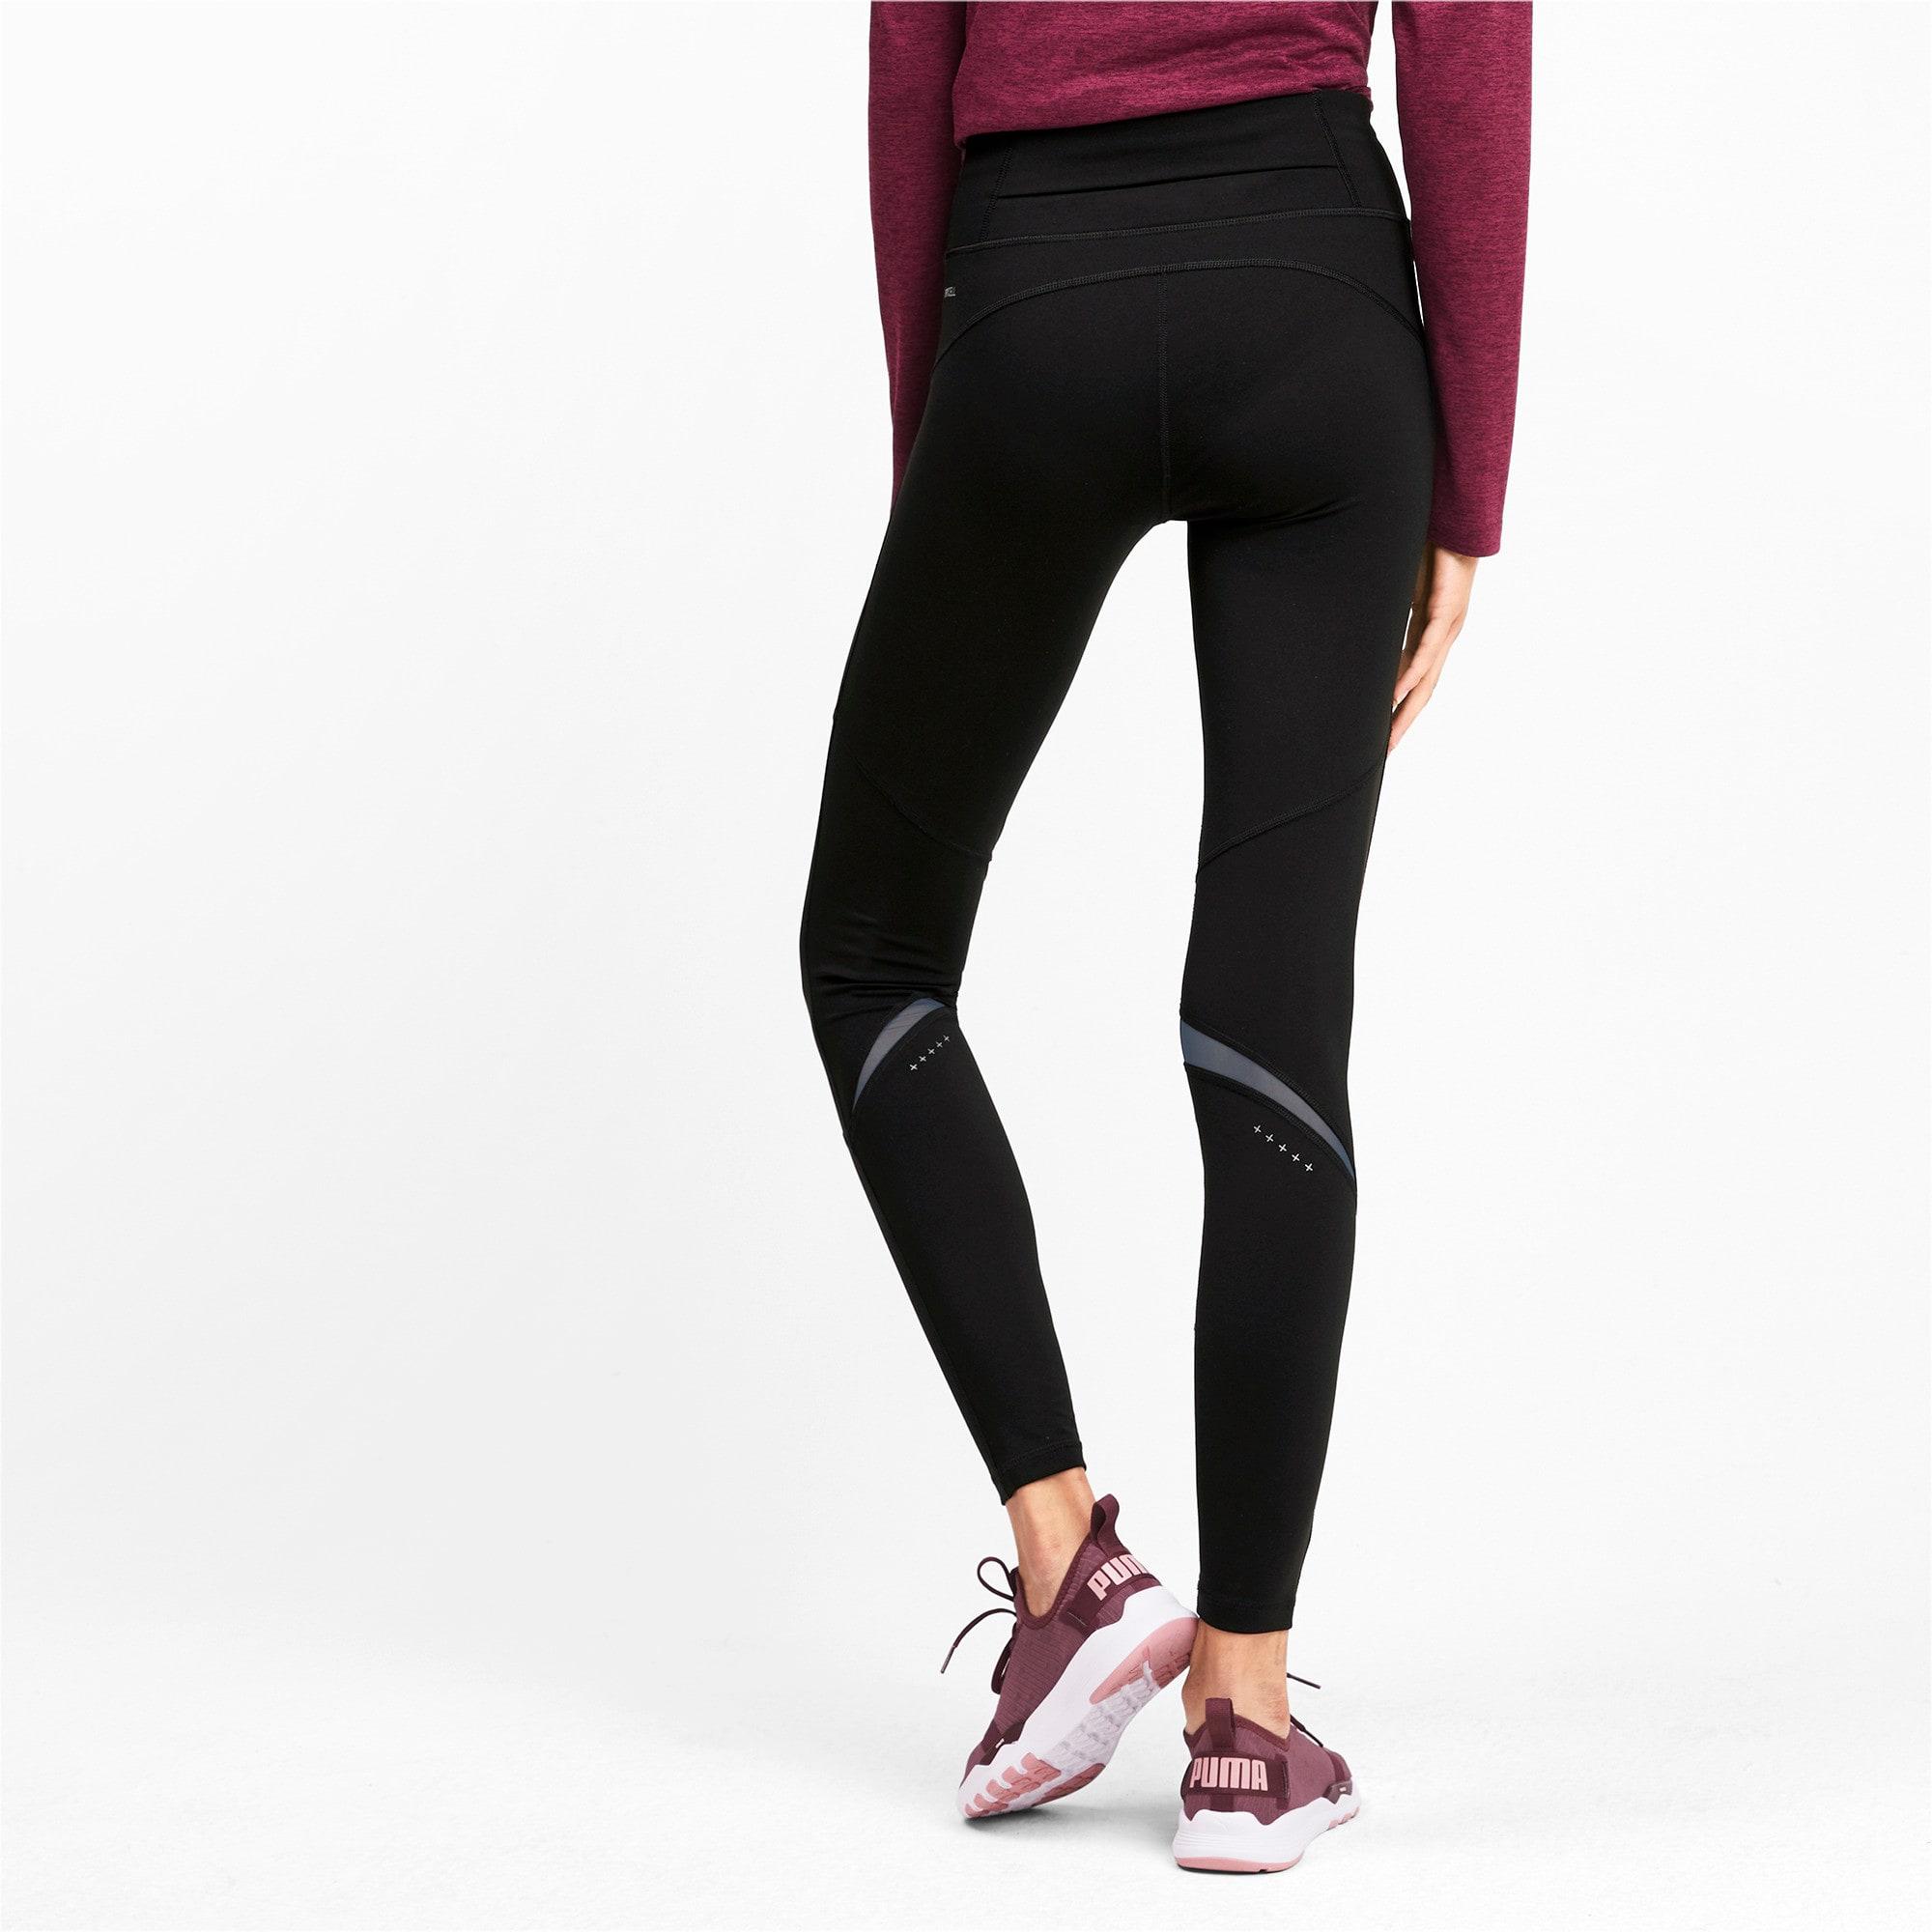 Thumbnail 2 of IGNITE Women's Running Tights, Puma Black, medium-IND